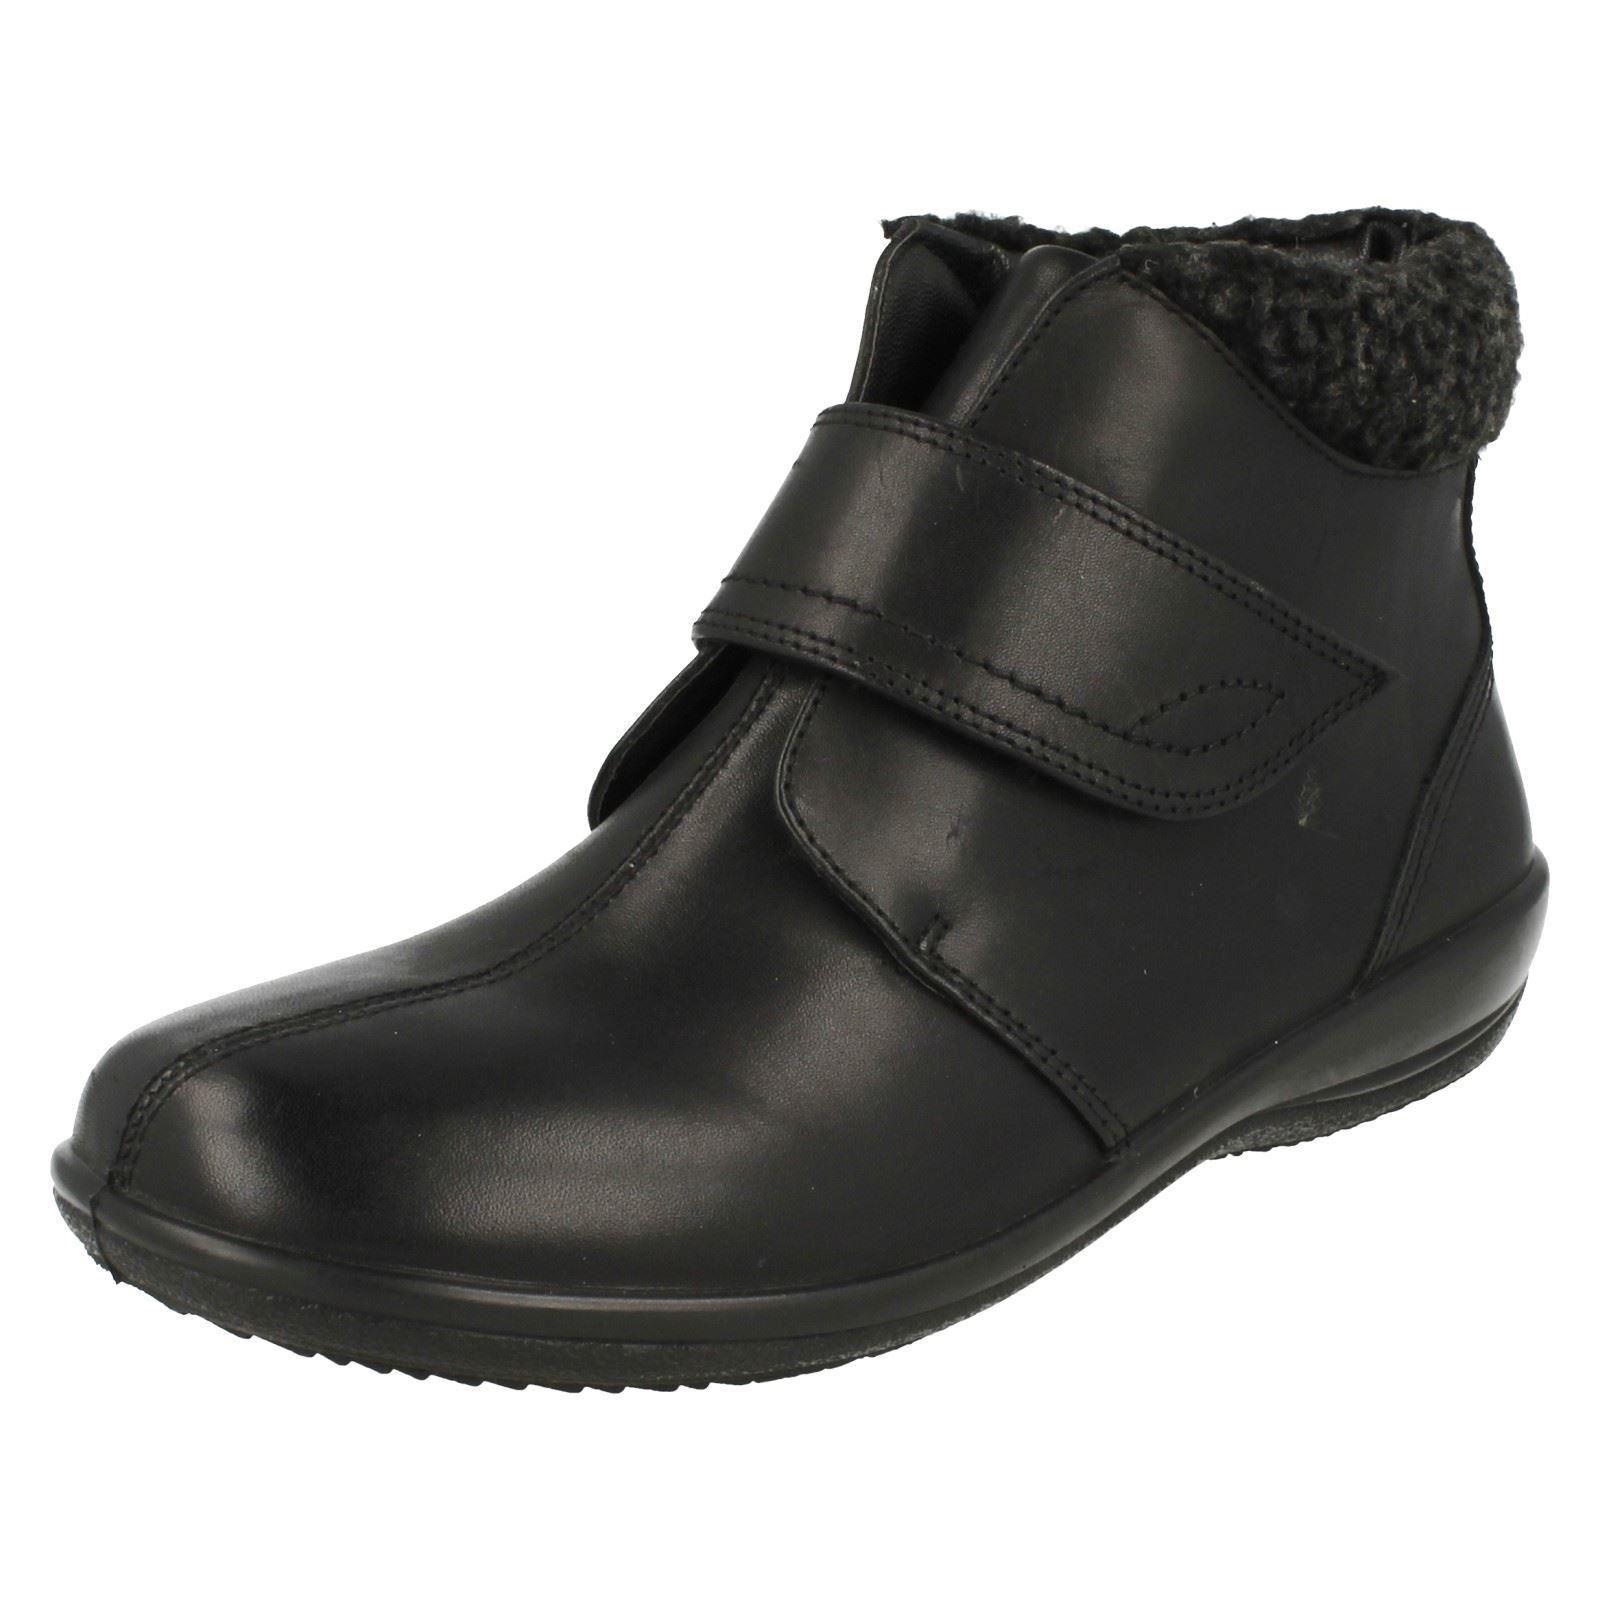 Padders Plus tamaño 4.5 Ida cm x amplio ajuste Ida 4.5 Cuero Negro botas al Tobillo Comodidad Plana 716989